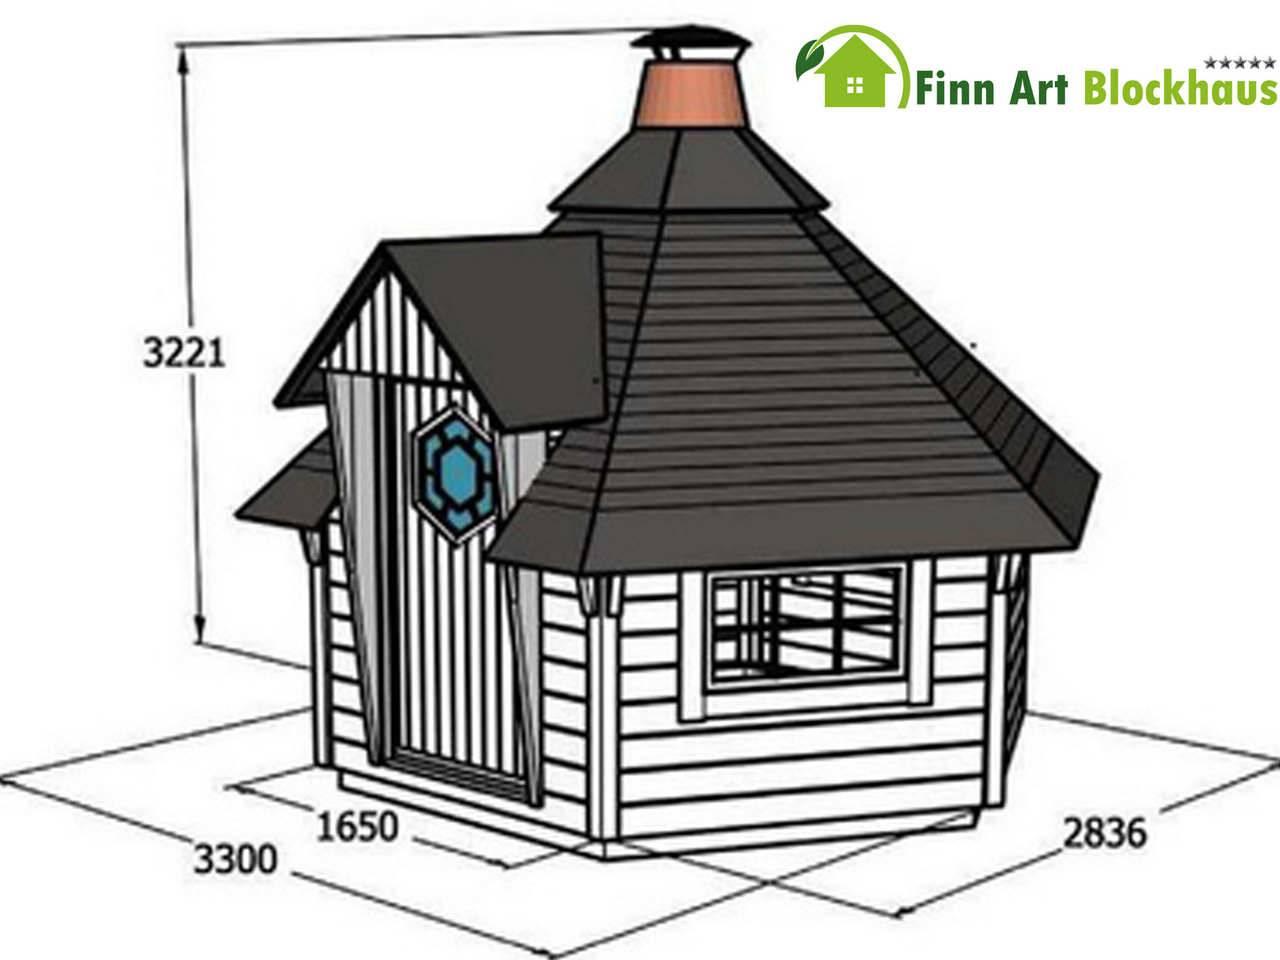 grillkota kota grillh tte finnland 7 premium top grillanlage finn art ebay. Black Bedroom Furniture Sets. Home Design Ideas